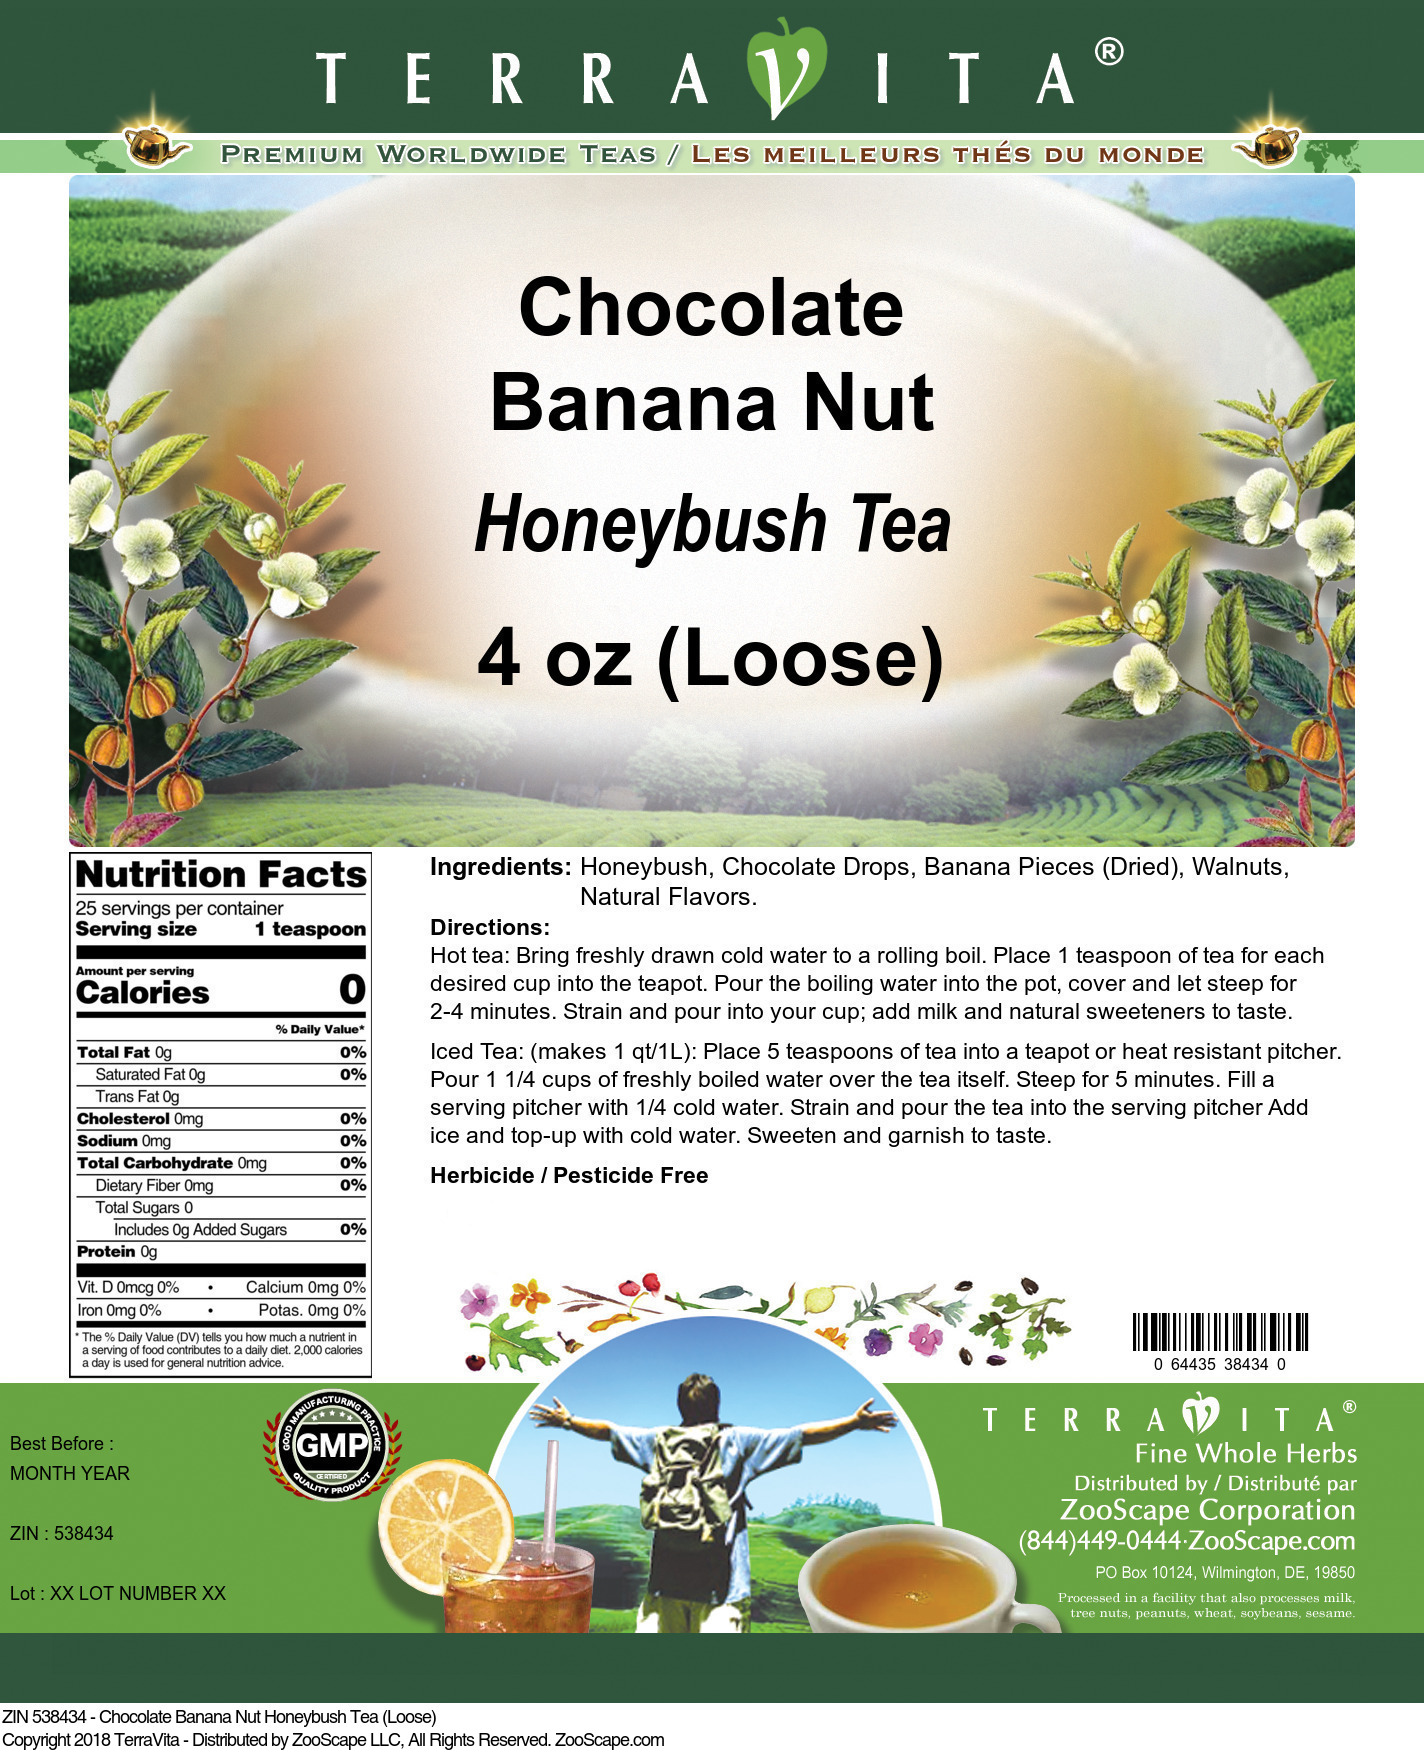 Chocolate Banana Nut Honeybush Tea